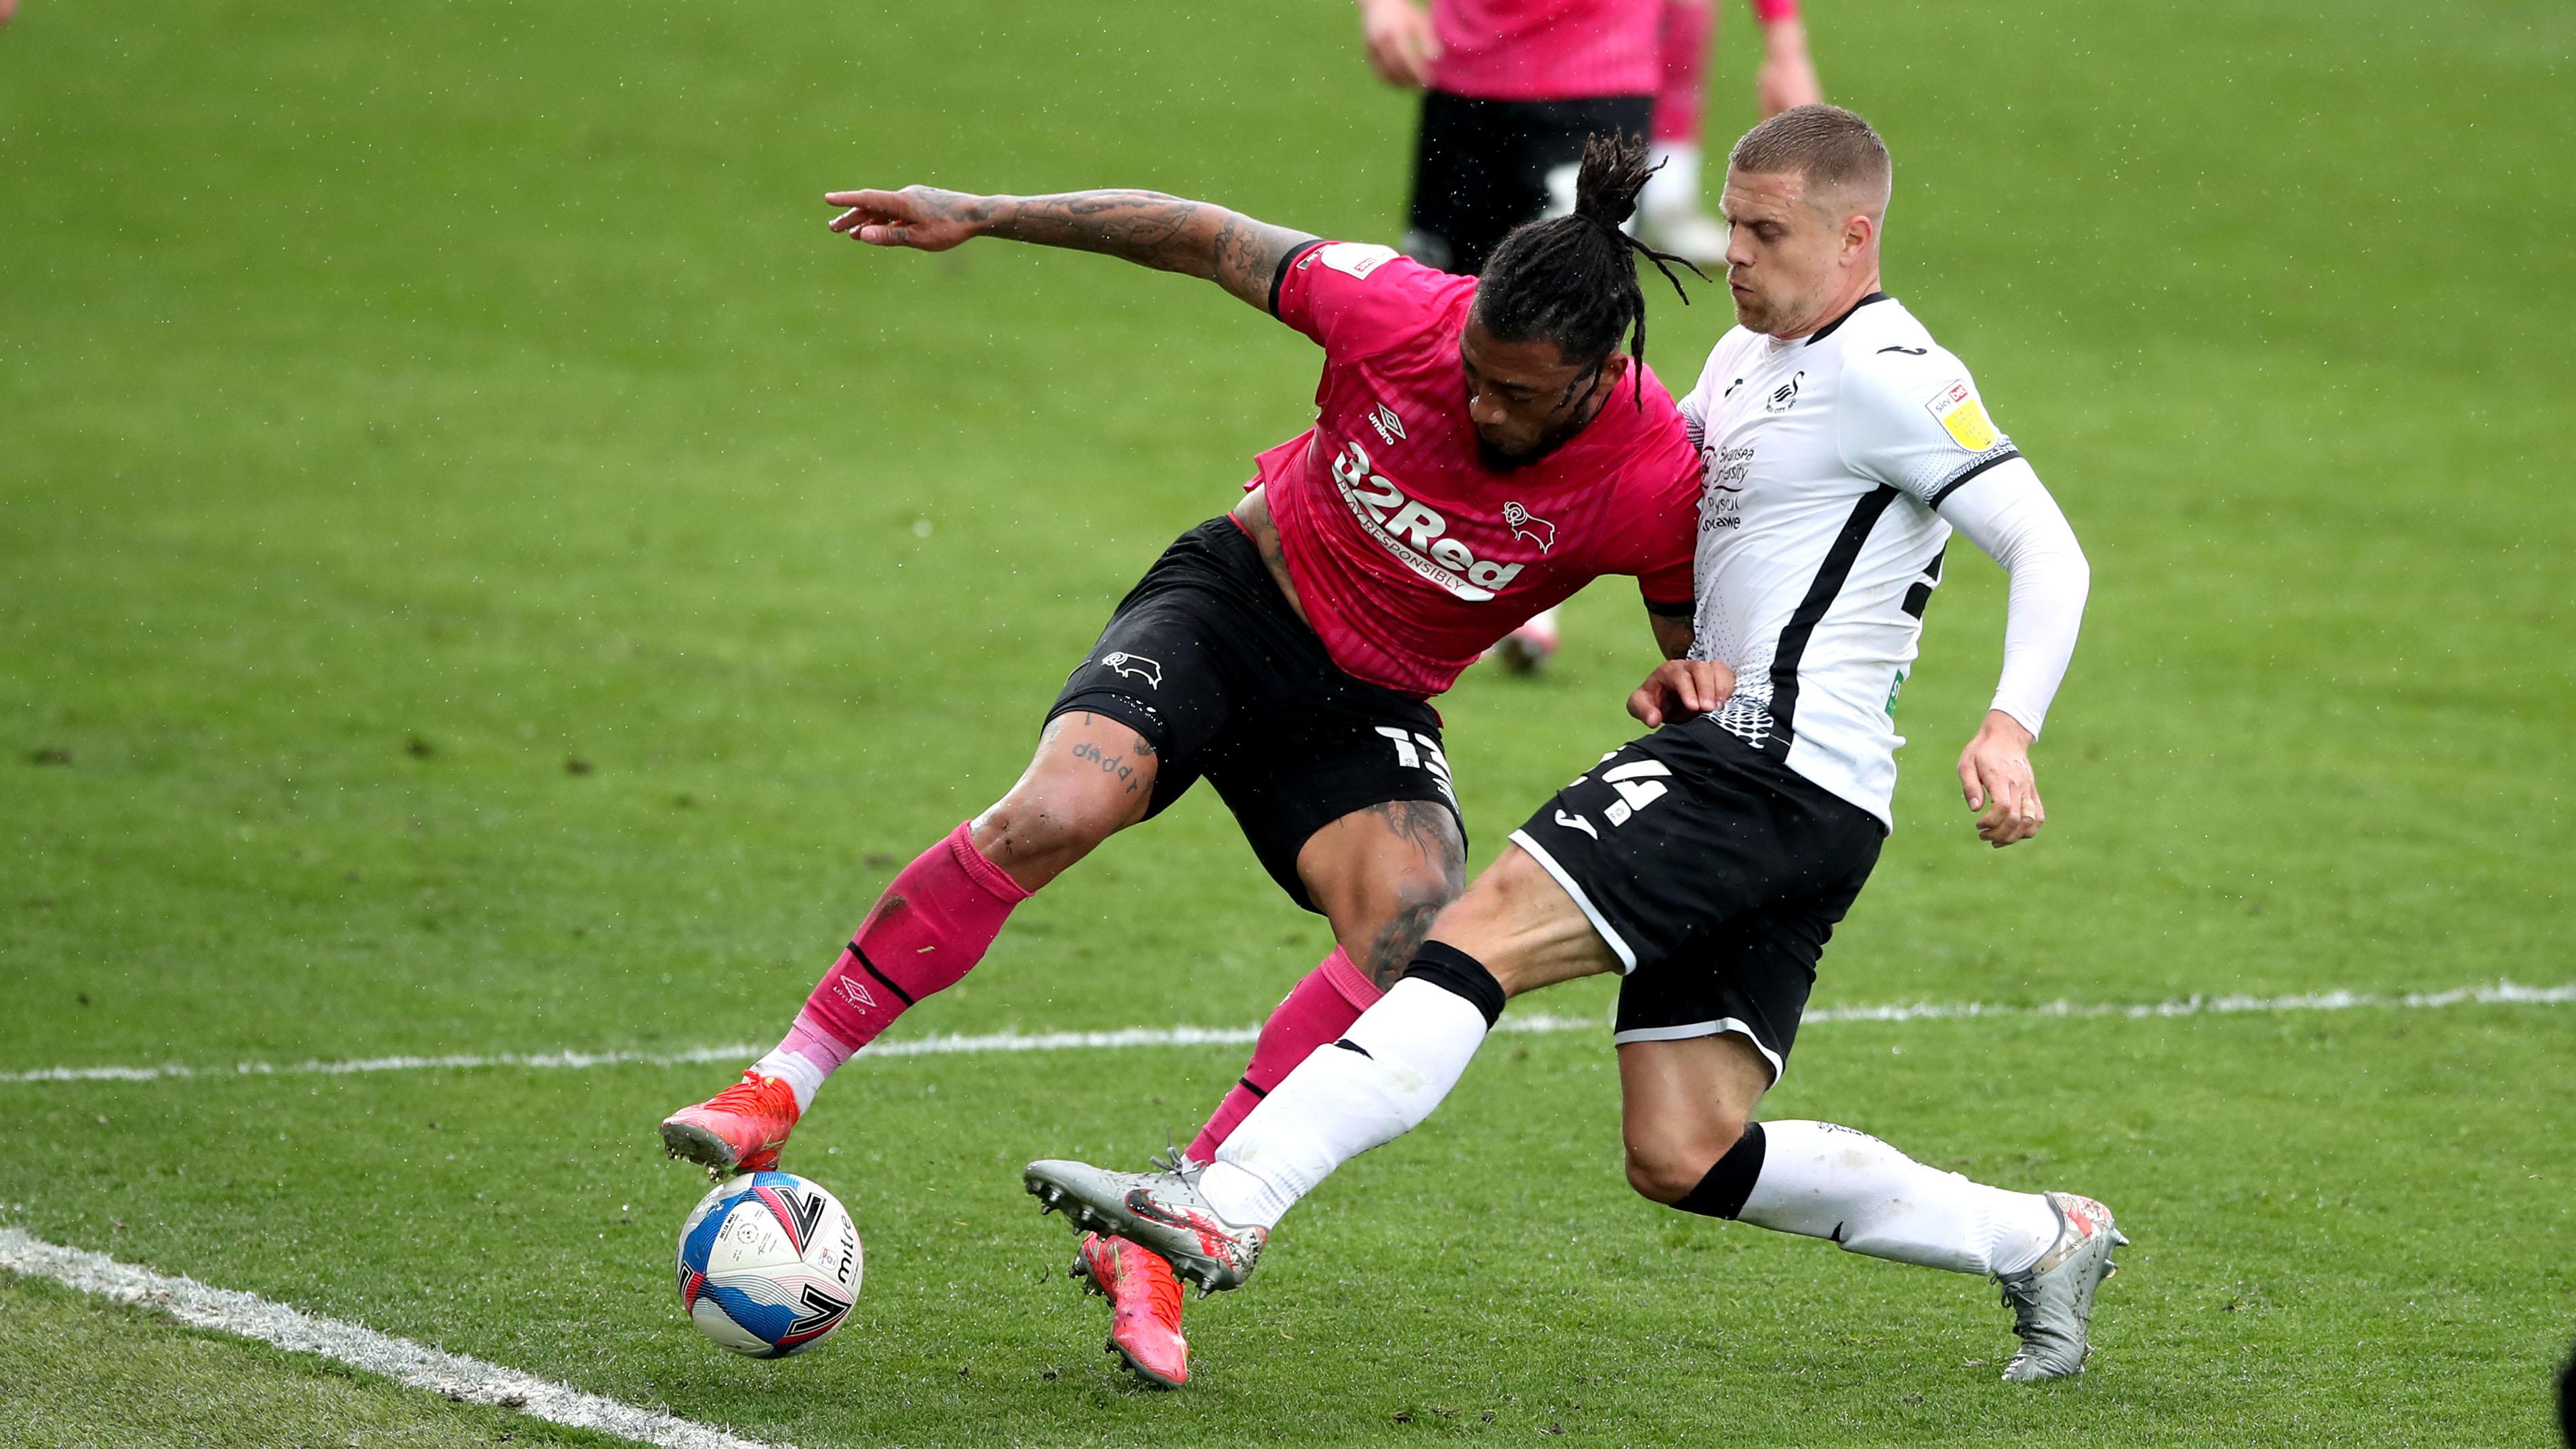 Swansea City v Derby